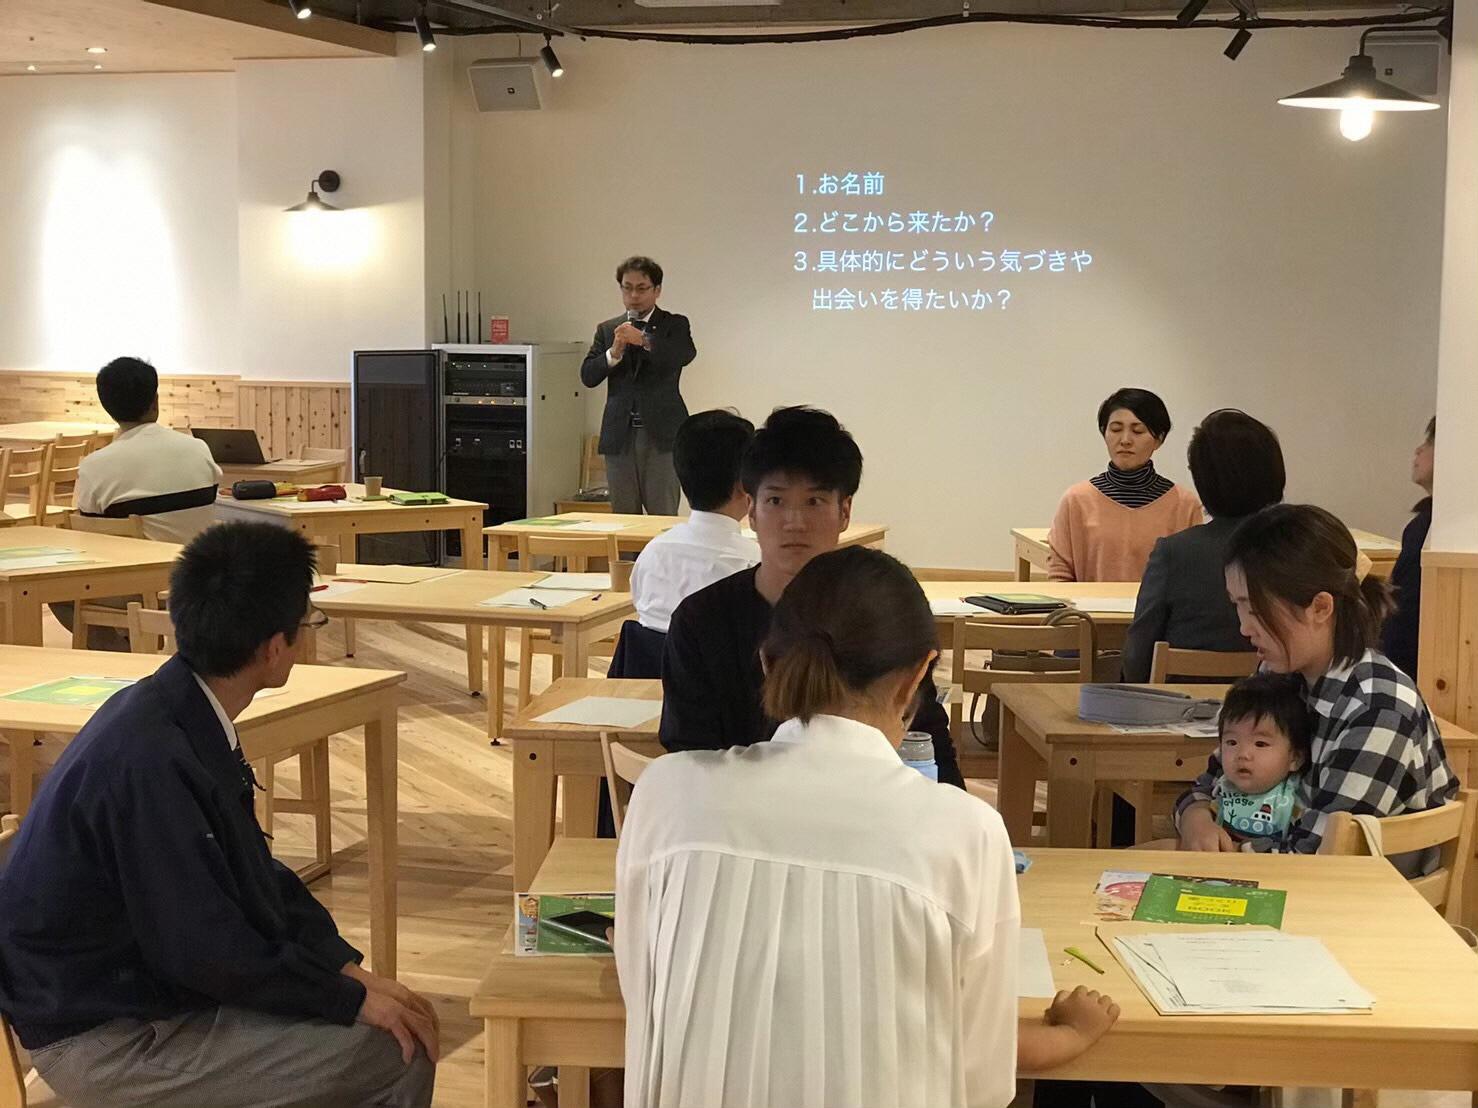 http://www.shizutan.jp/ondanka/event/2020/01/07/images/IMG-3963.JPG